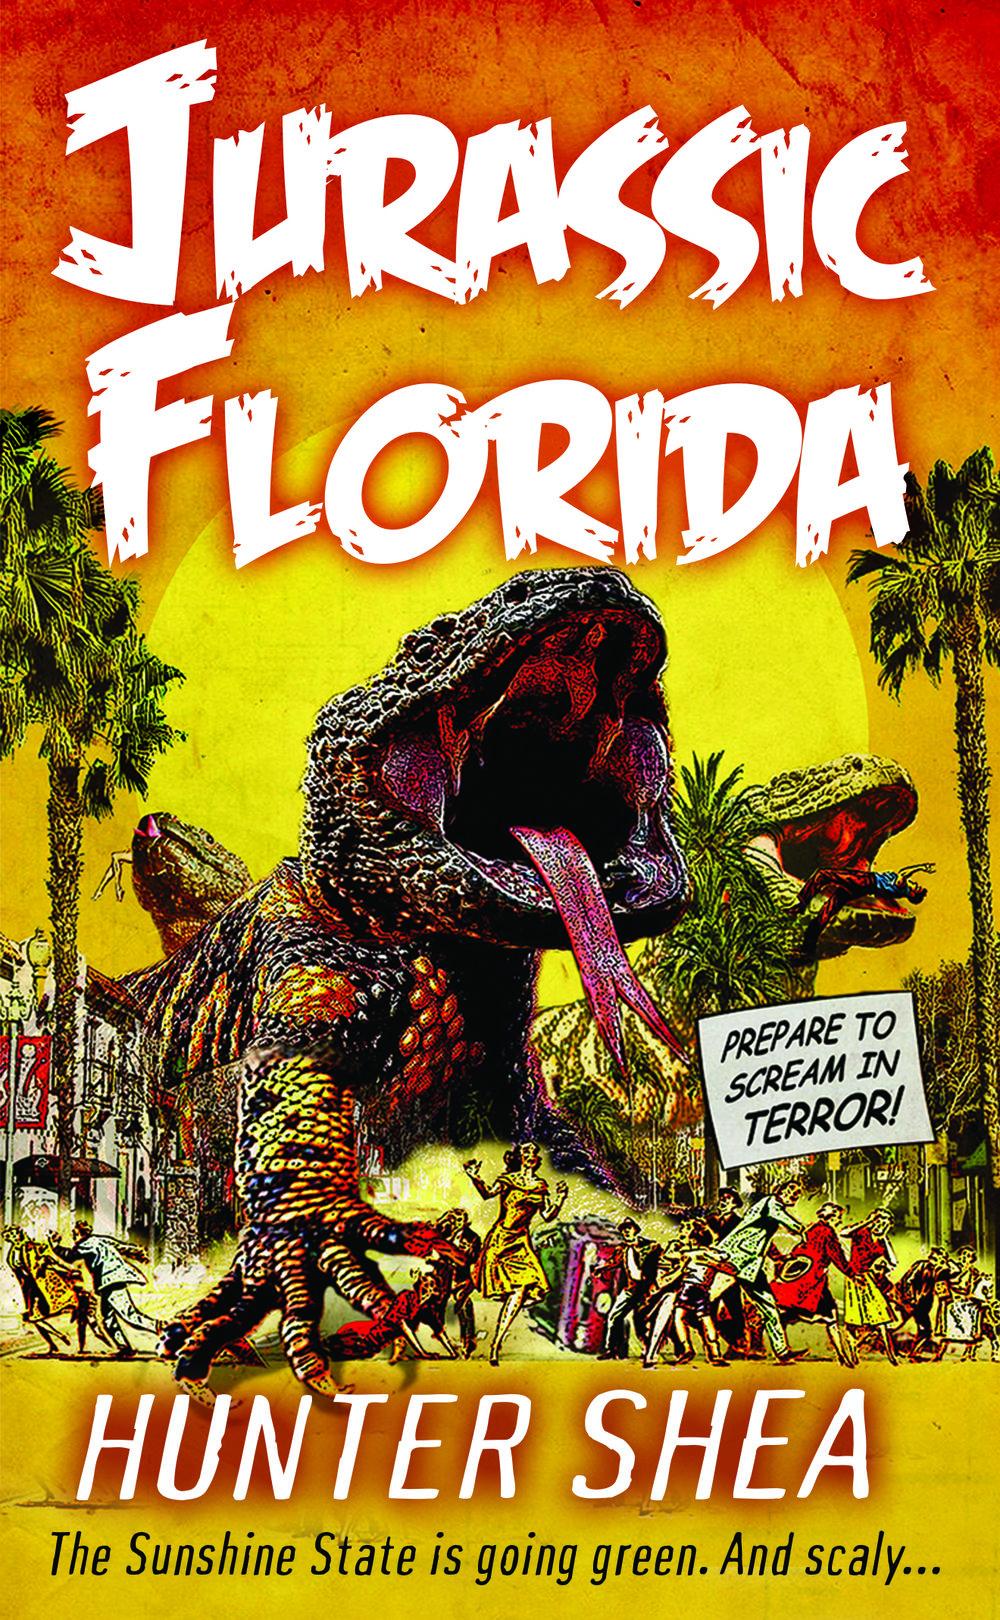 Jurassic Florida.jpg